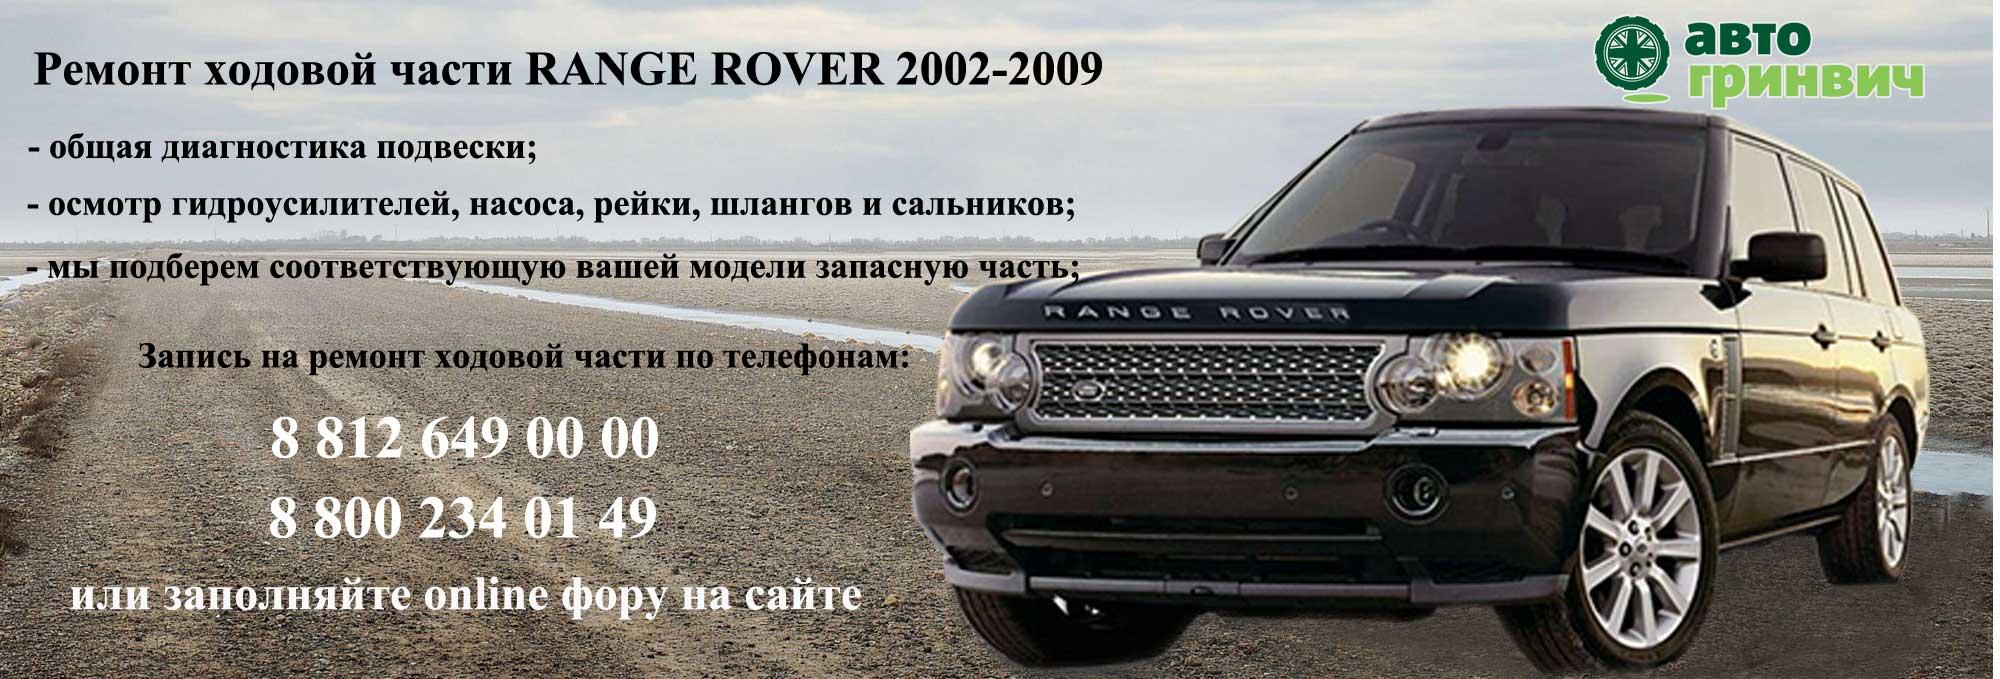 Ремонт ходовой части RR 2002-2009